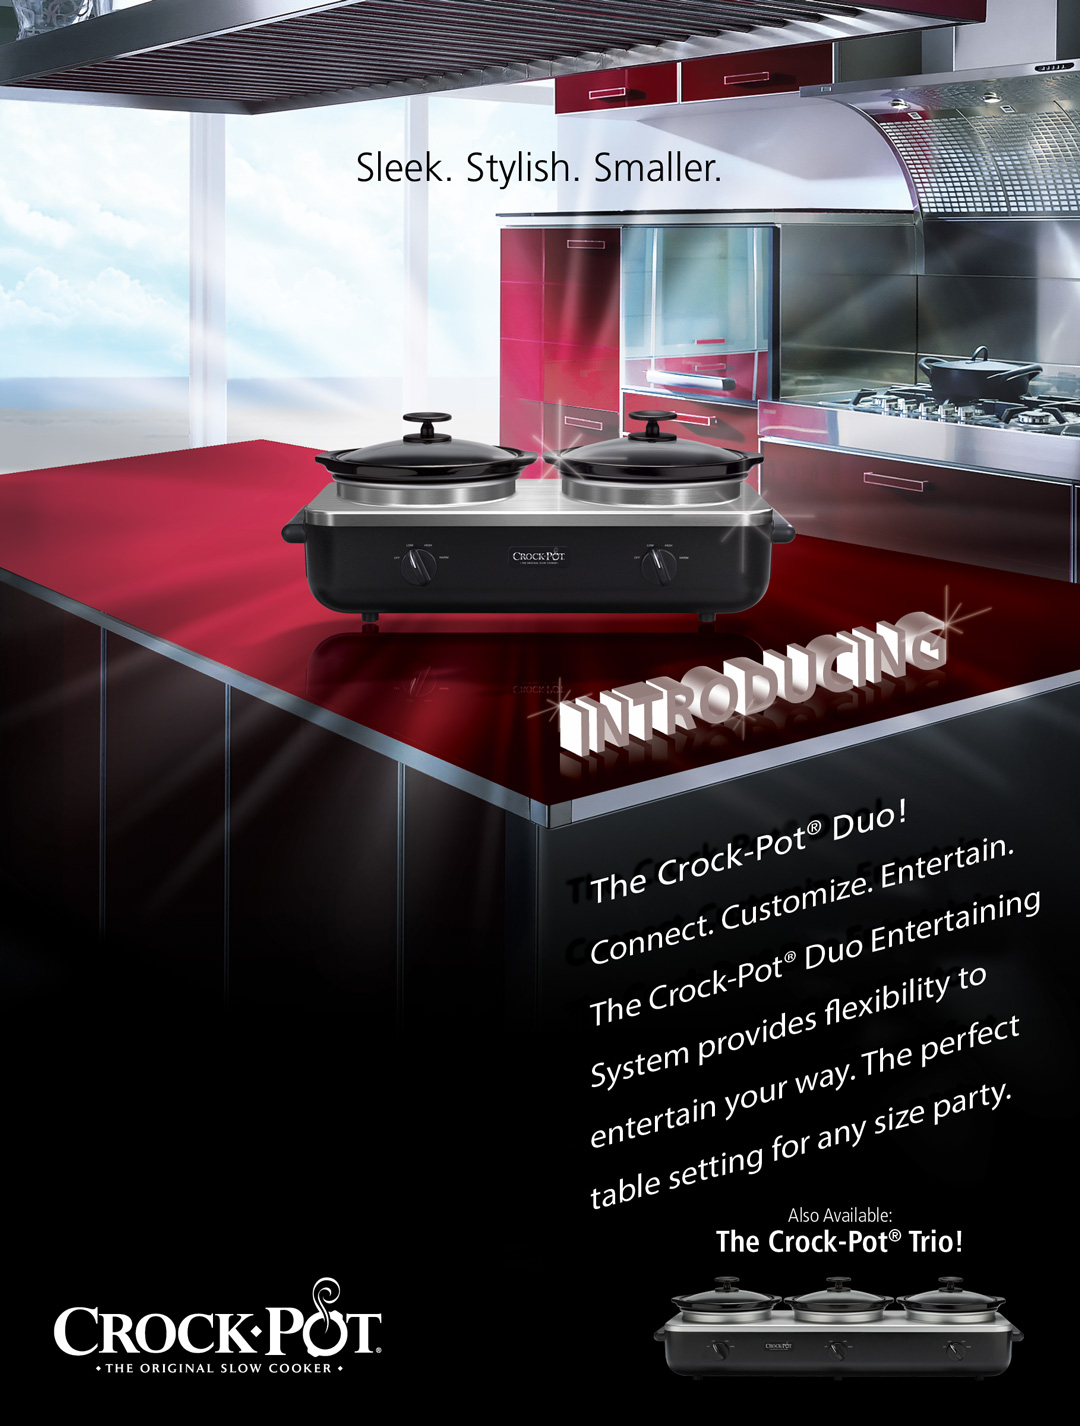 CrockPot Duo Ad Design